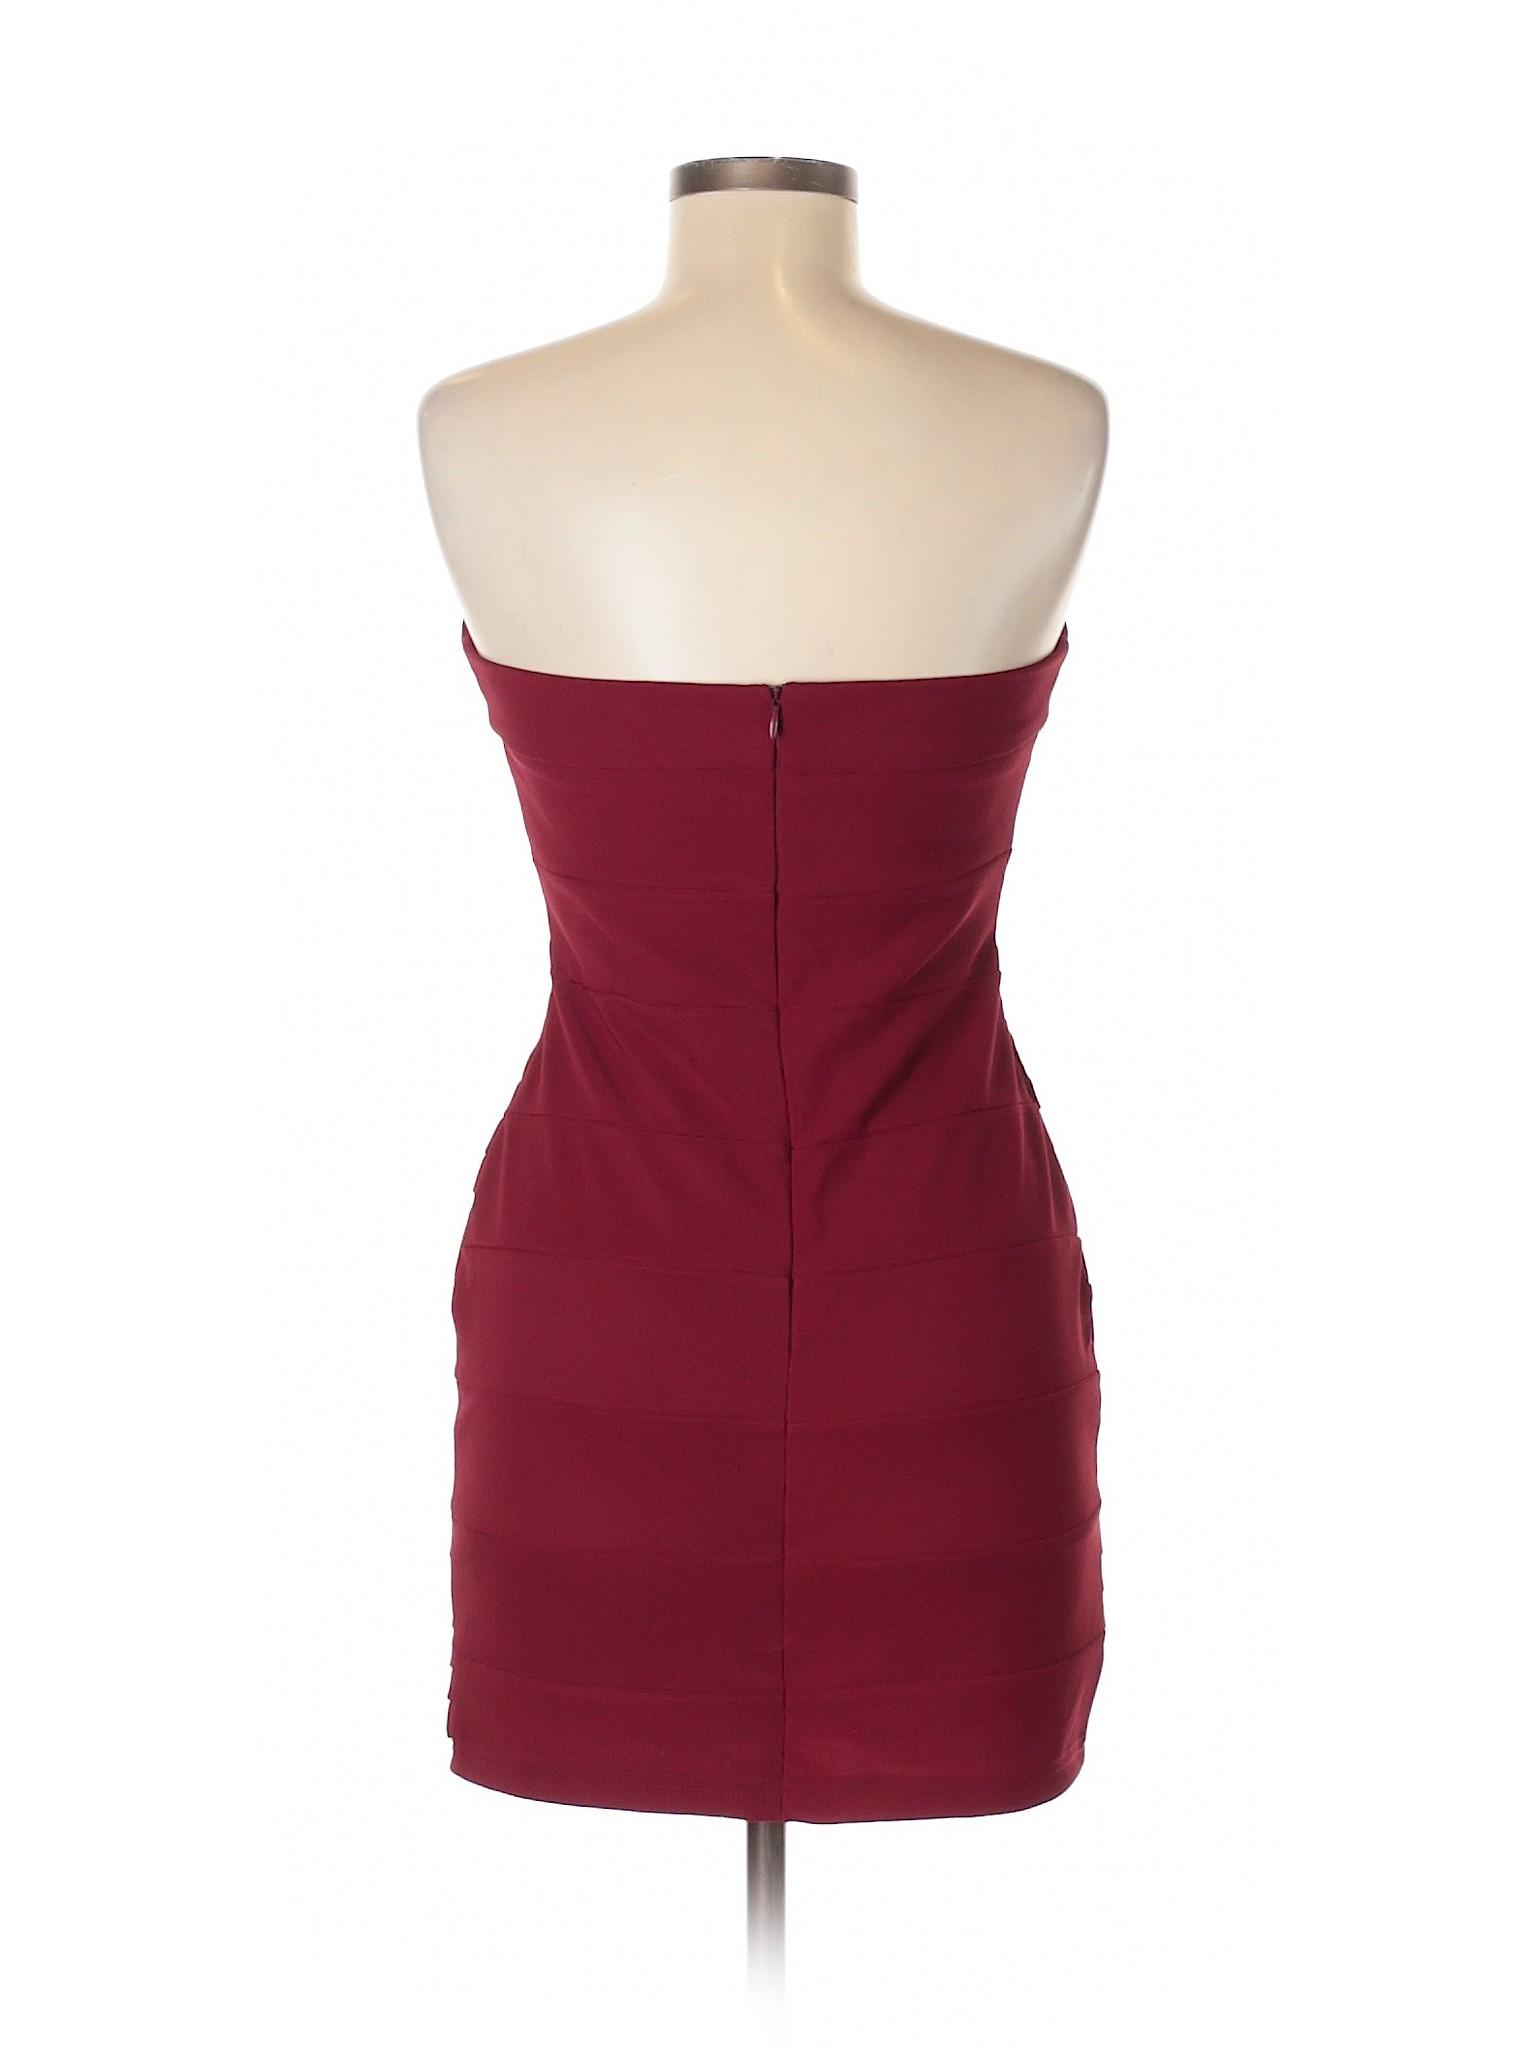 TOBI Boutique Dress Boutique winter winter Casual Cqw5tpa